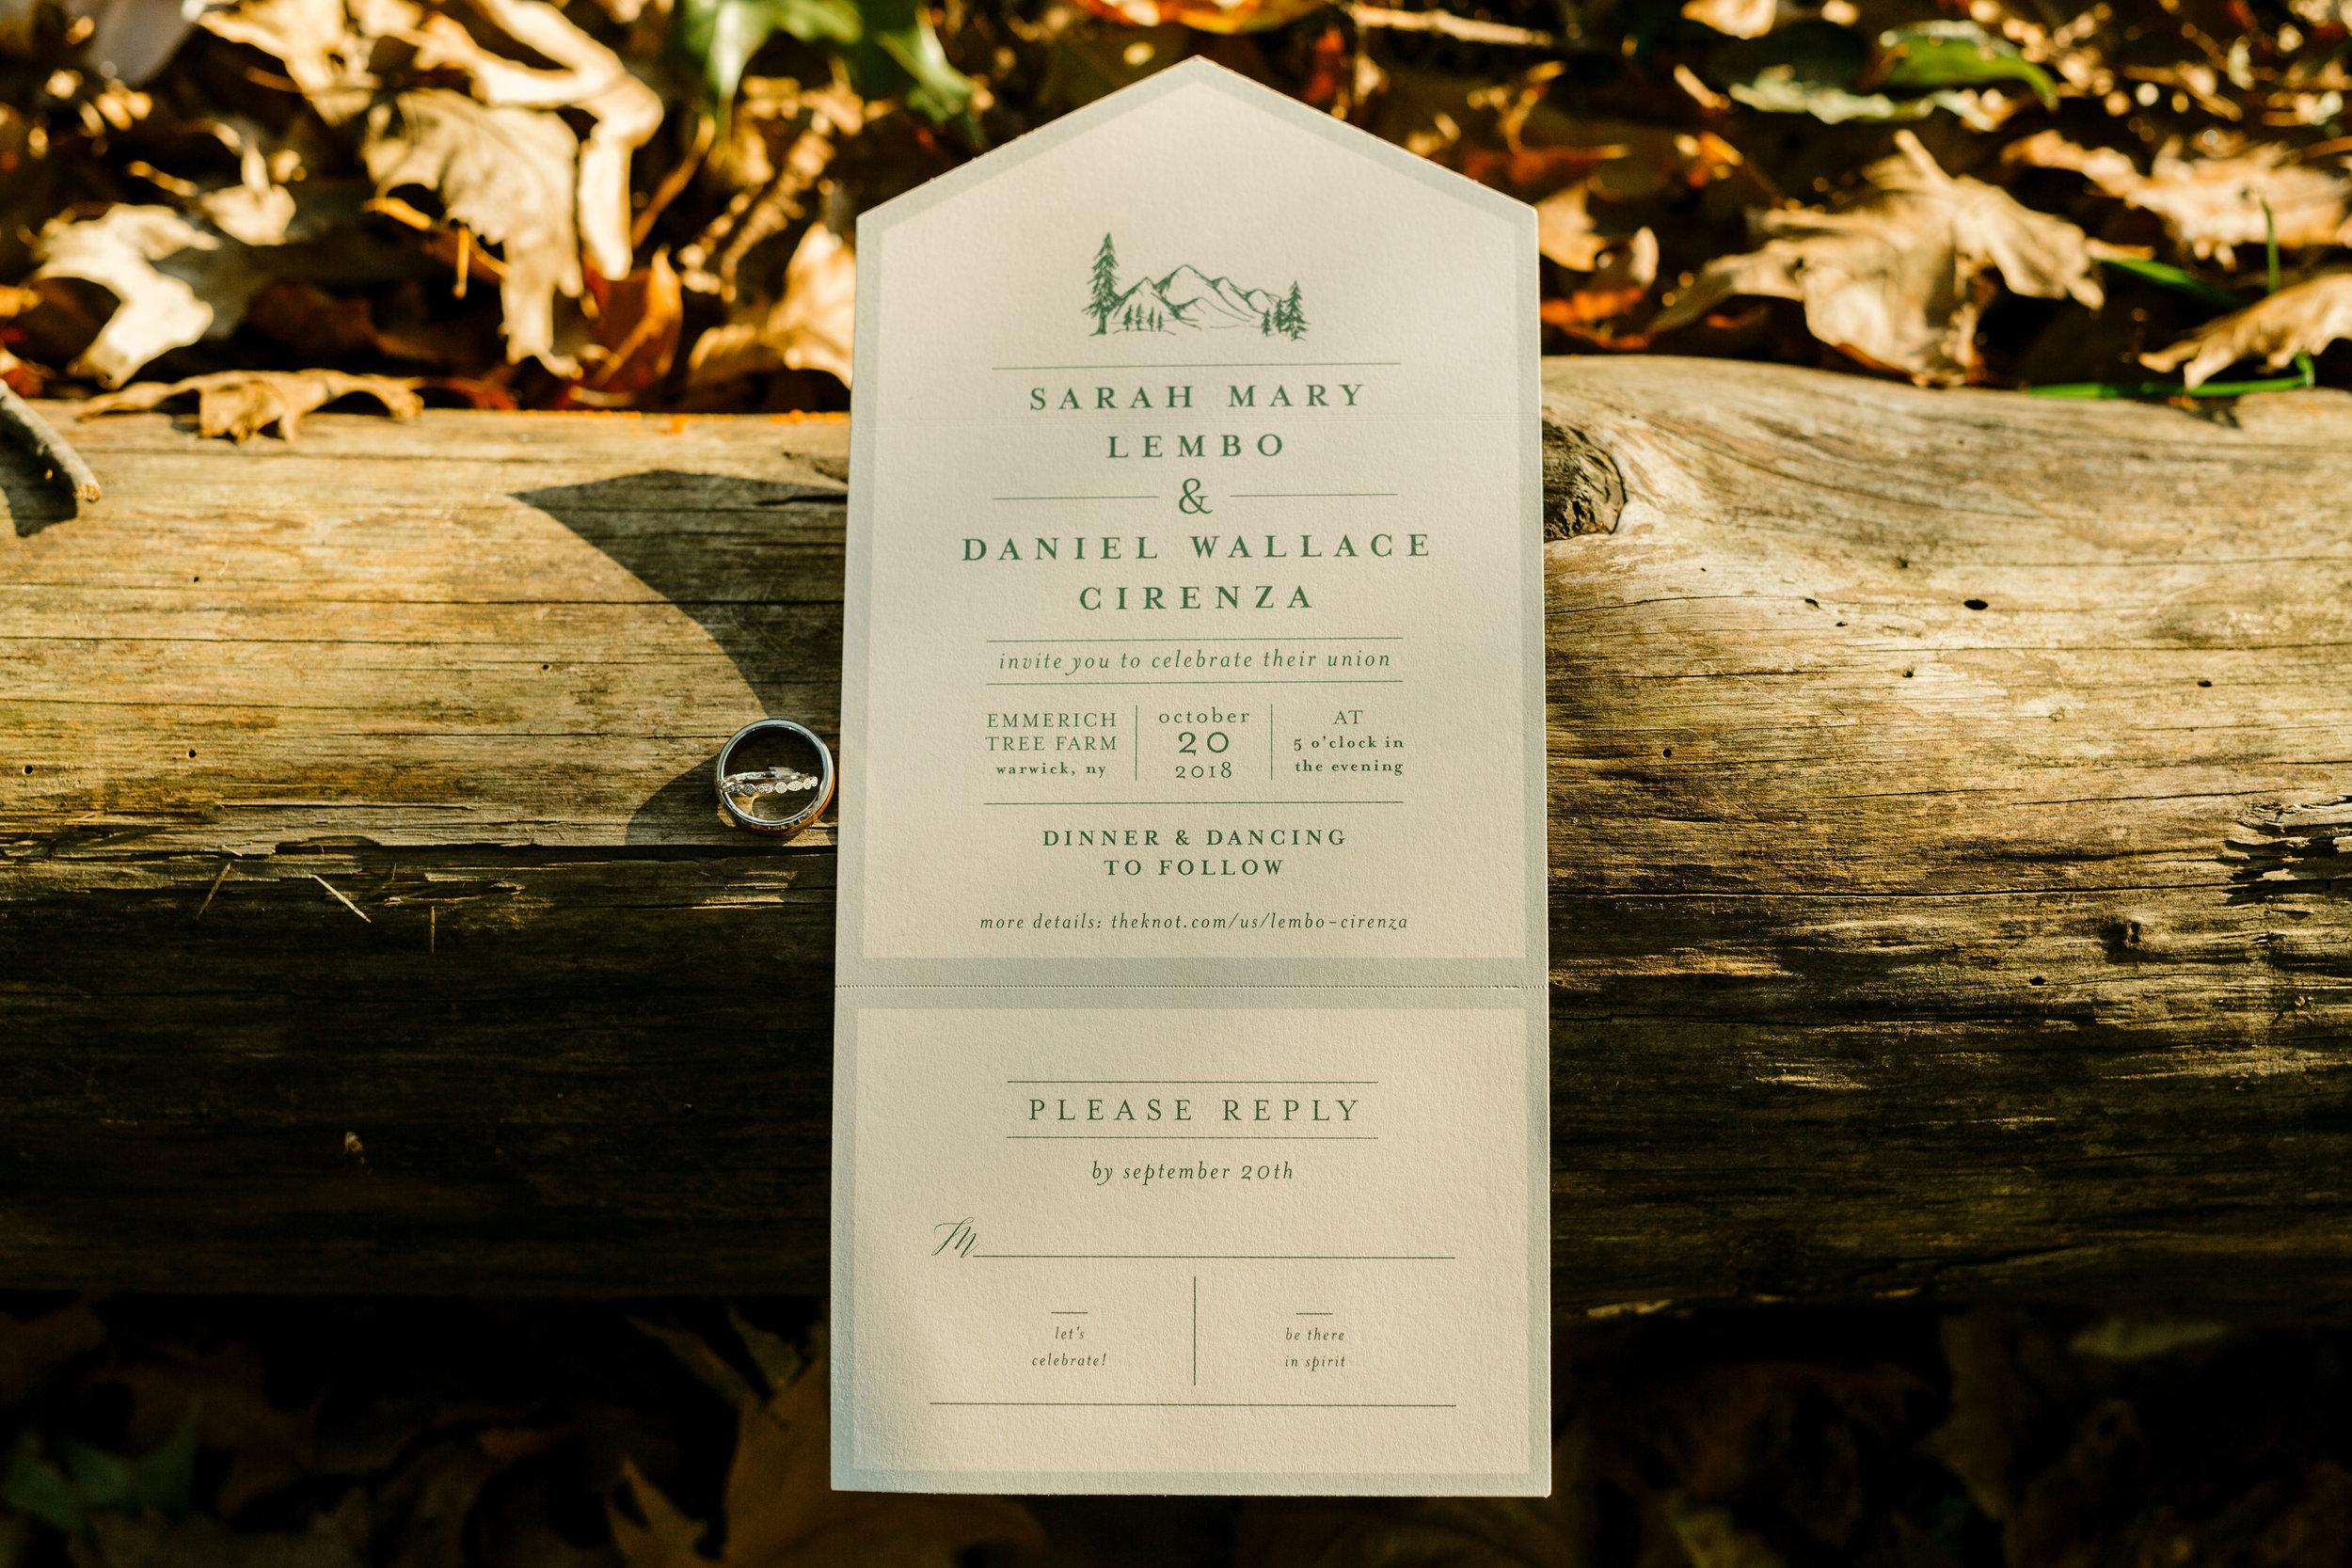 young-love-media-rustic-fall-autumn-wedding-emmerich-tree-farm-hudson-valley-warwick-new-york-getting-ready-197.jpg